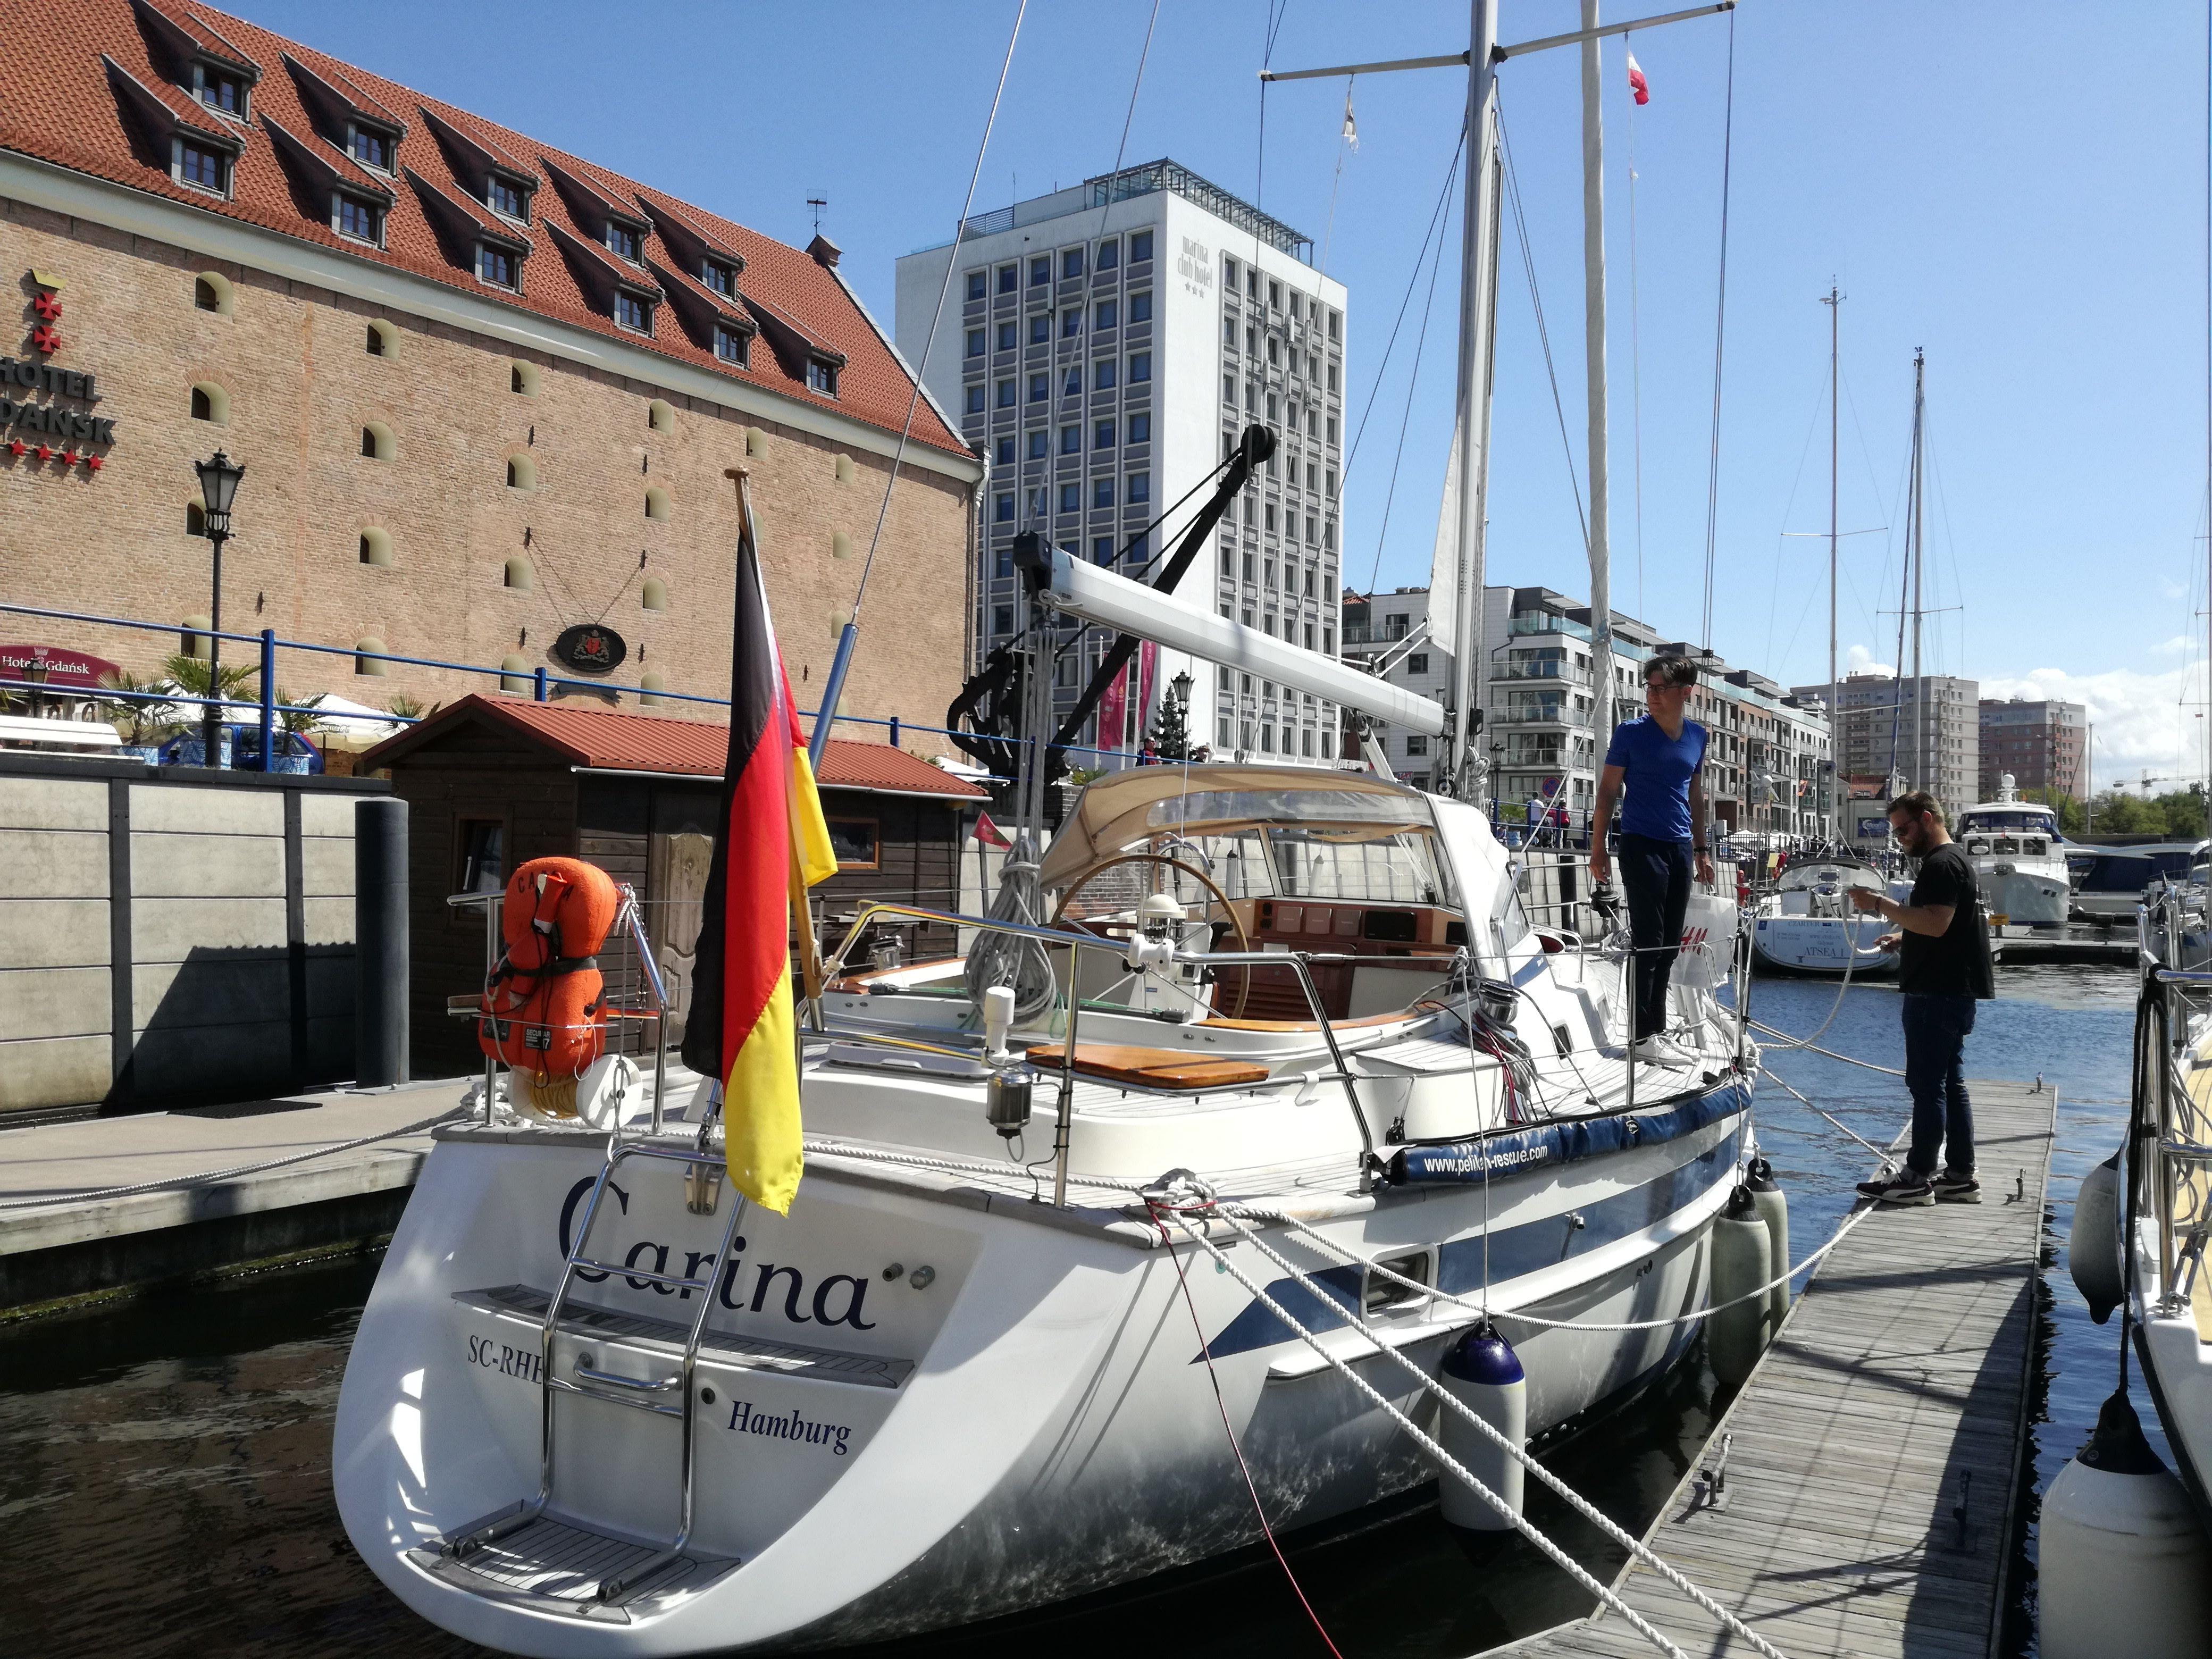 Foto Gallerie | Segelclub Rhe | Hamburg